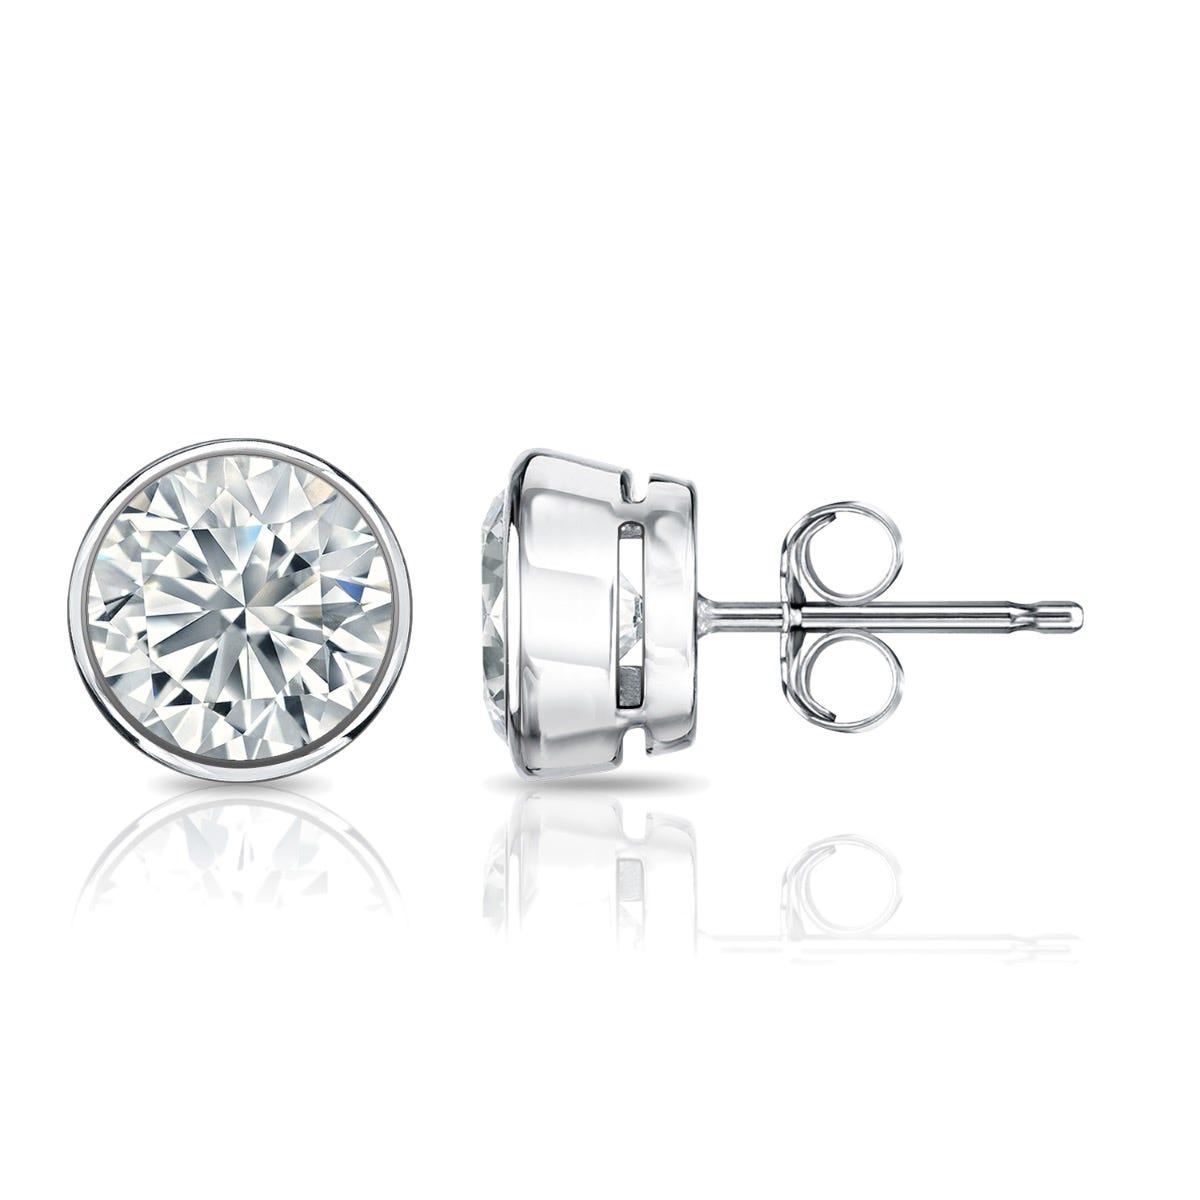 Diamond Round Bezel-Set 1-1/2ctw. Solitaire Stud (IJ-I2) Earrings in Platinum